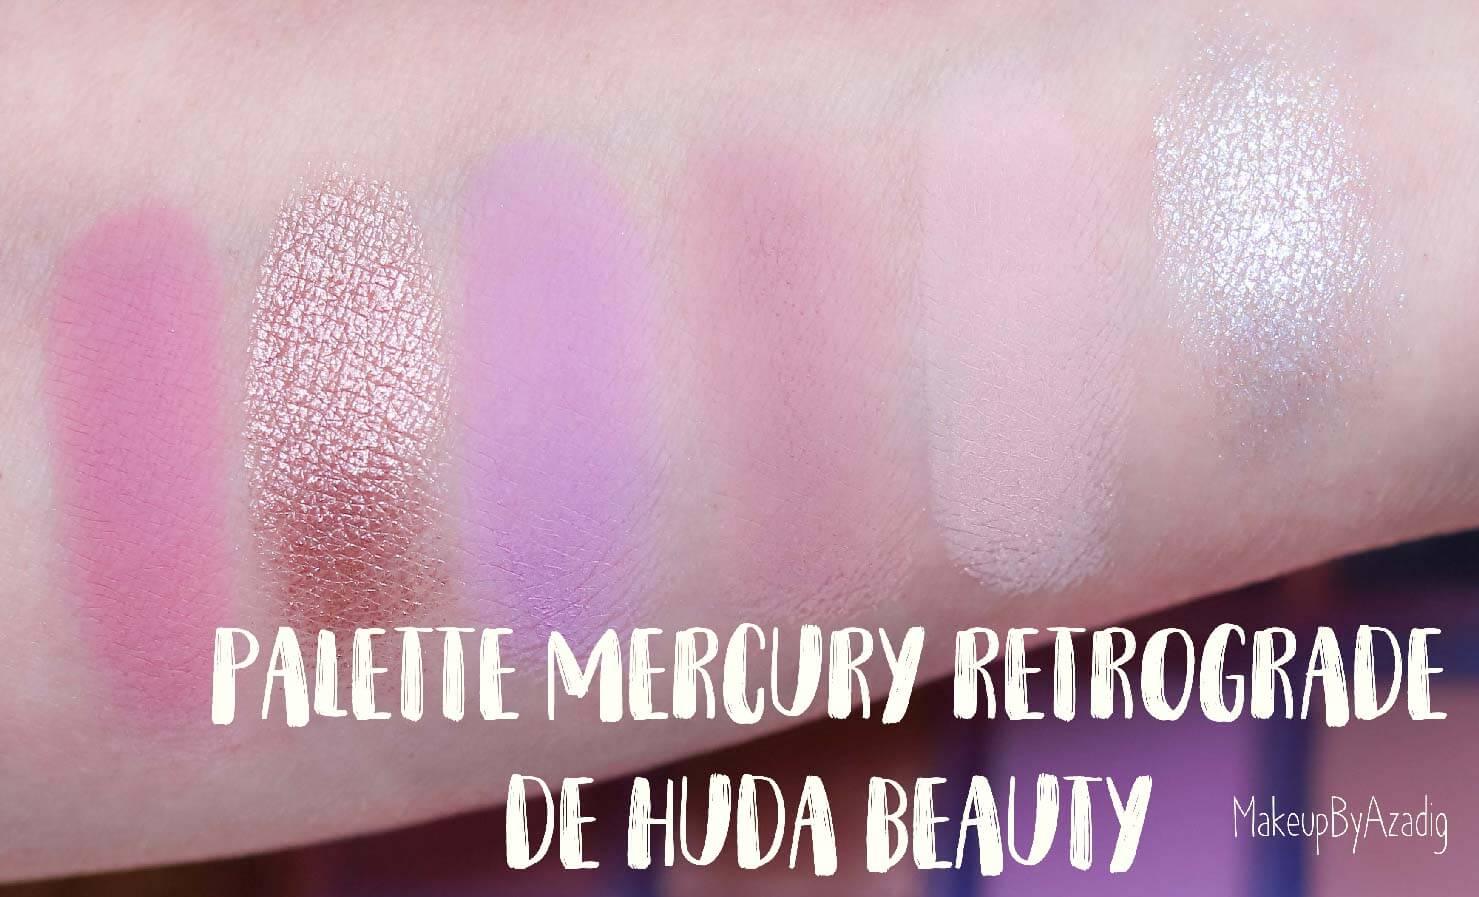 revue-palette-mercury-retrograde-huda-beauty-sephora-france-makeupbyazadig-avis-prix-swatch-astrologie-deuxieme